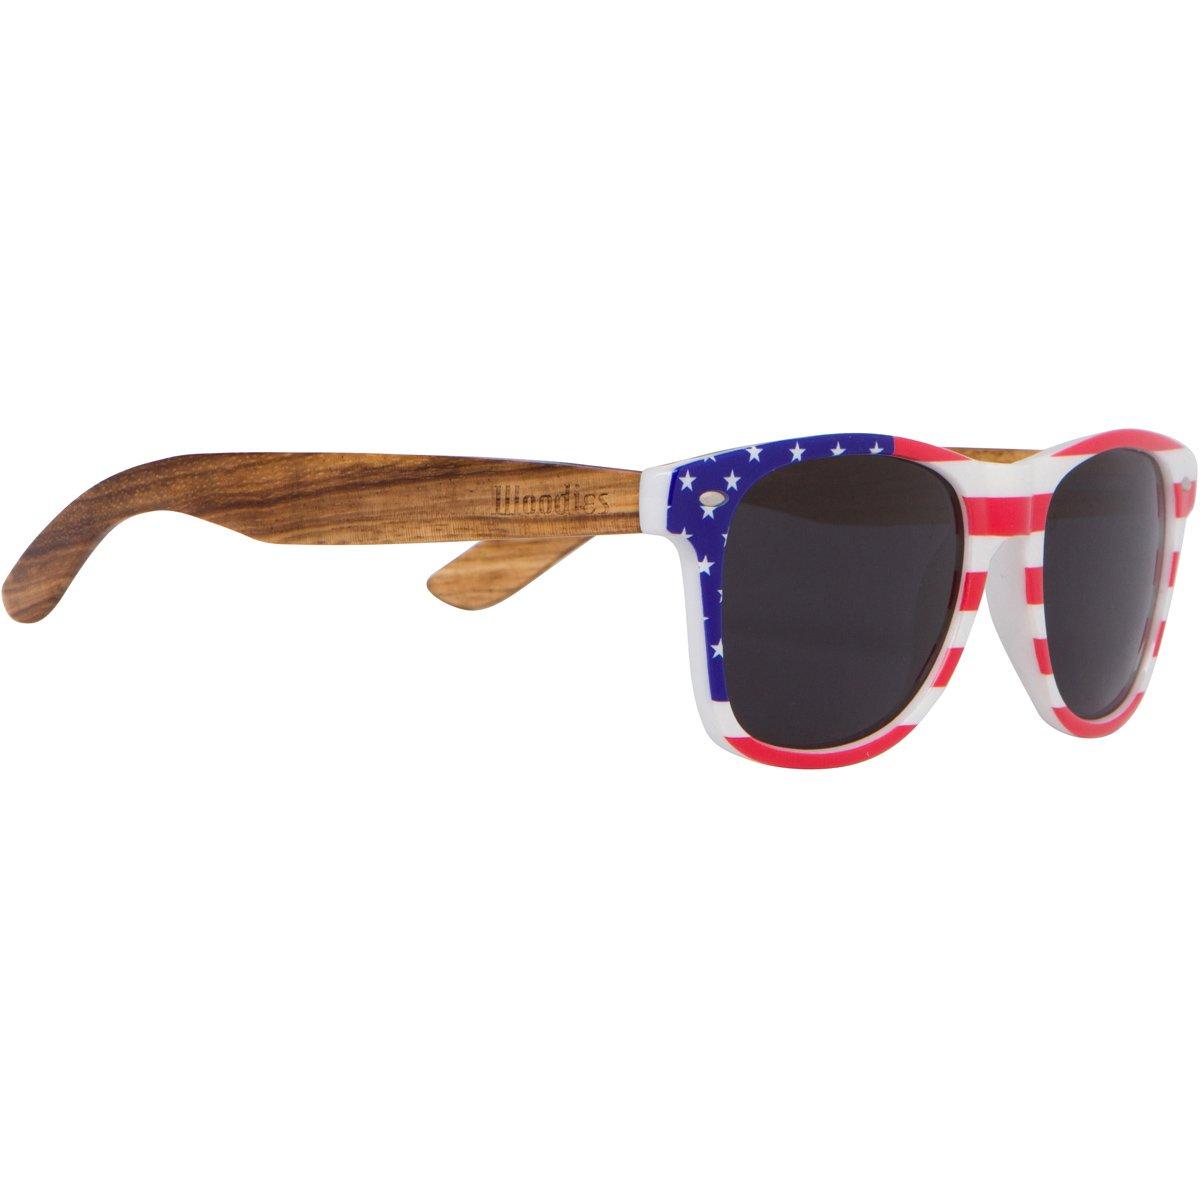 WOODIES Zebra Wood Polarized Sunglasses with American Flag Frame